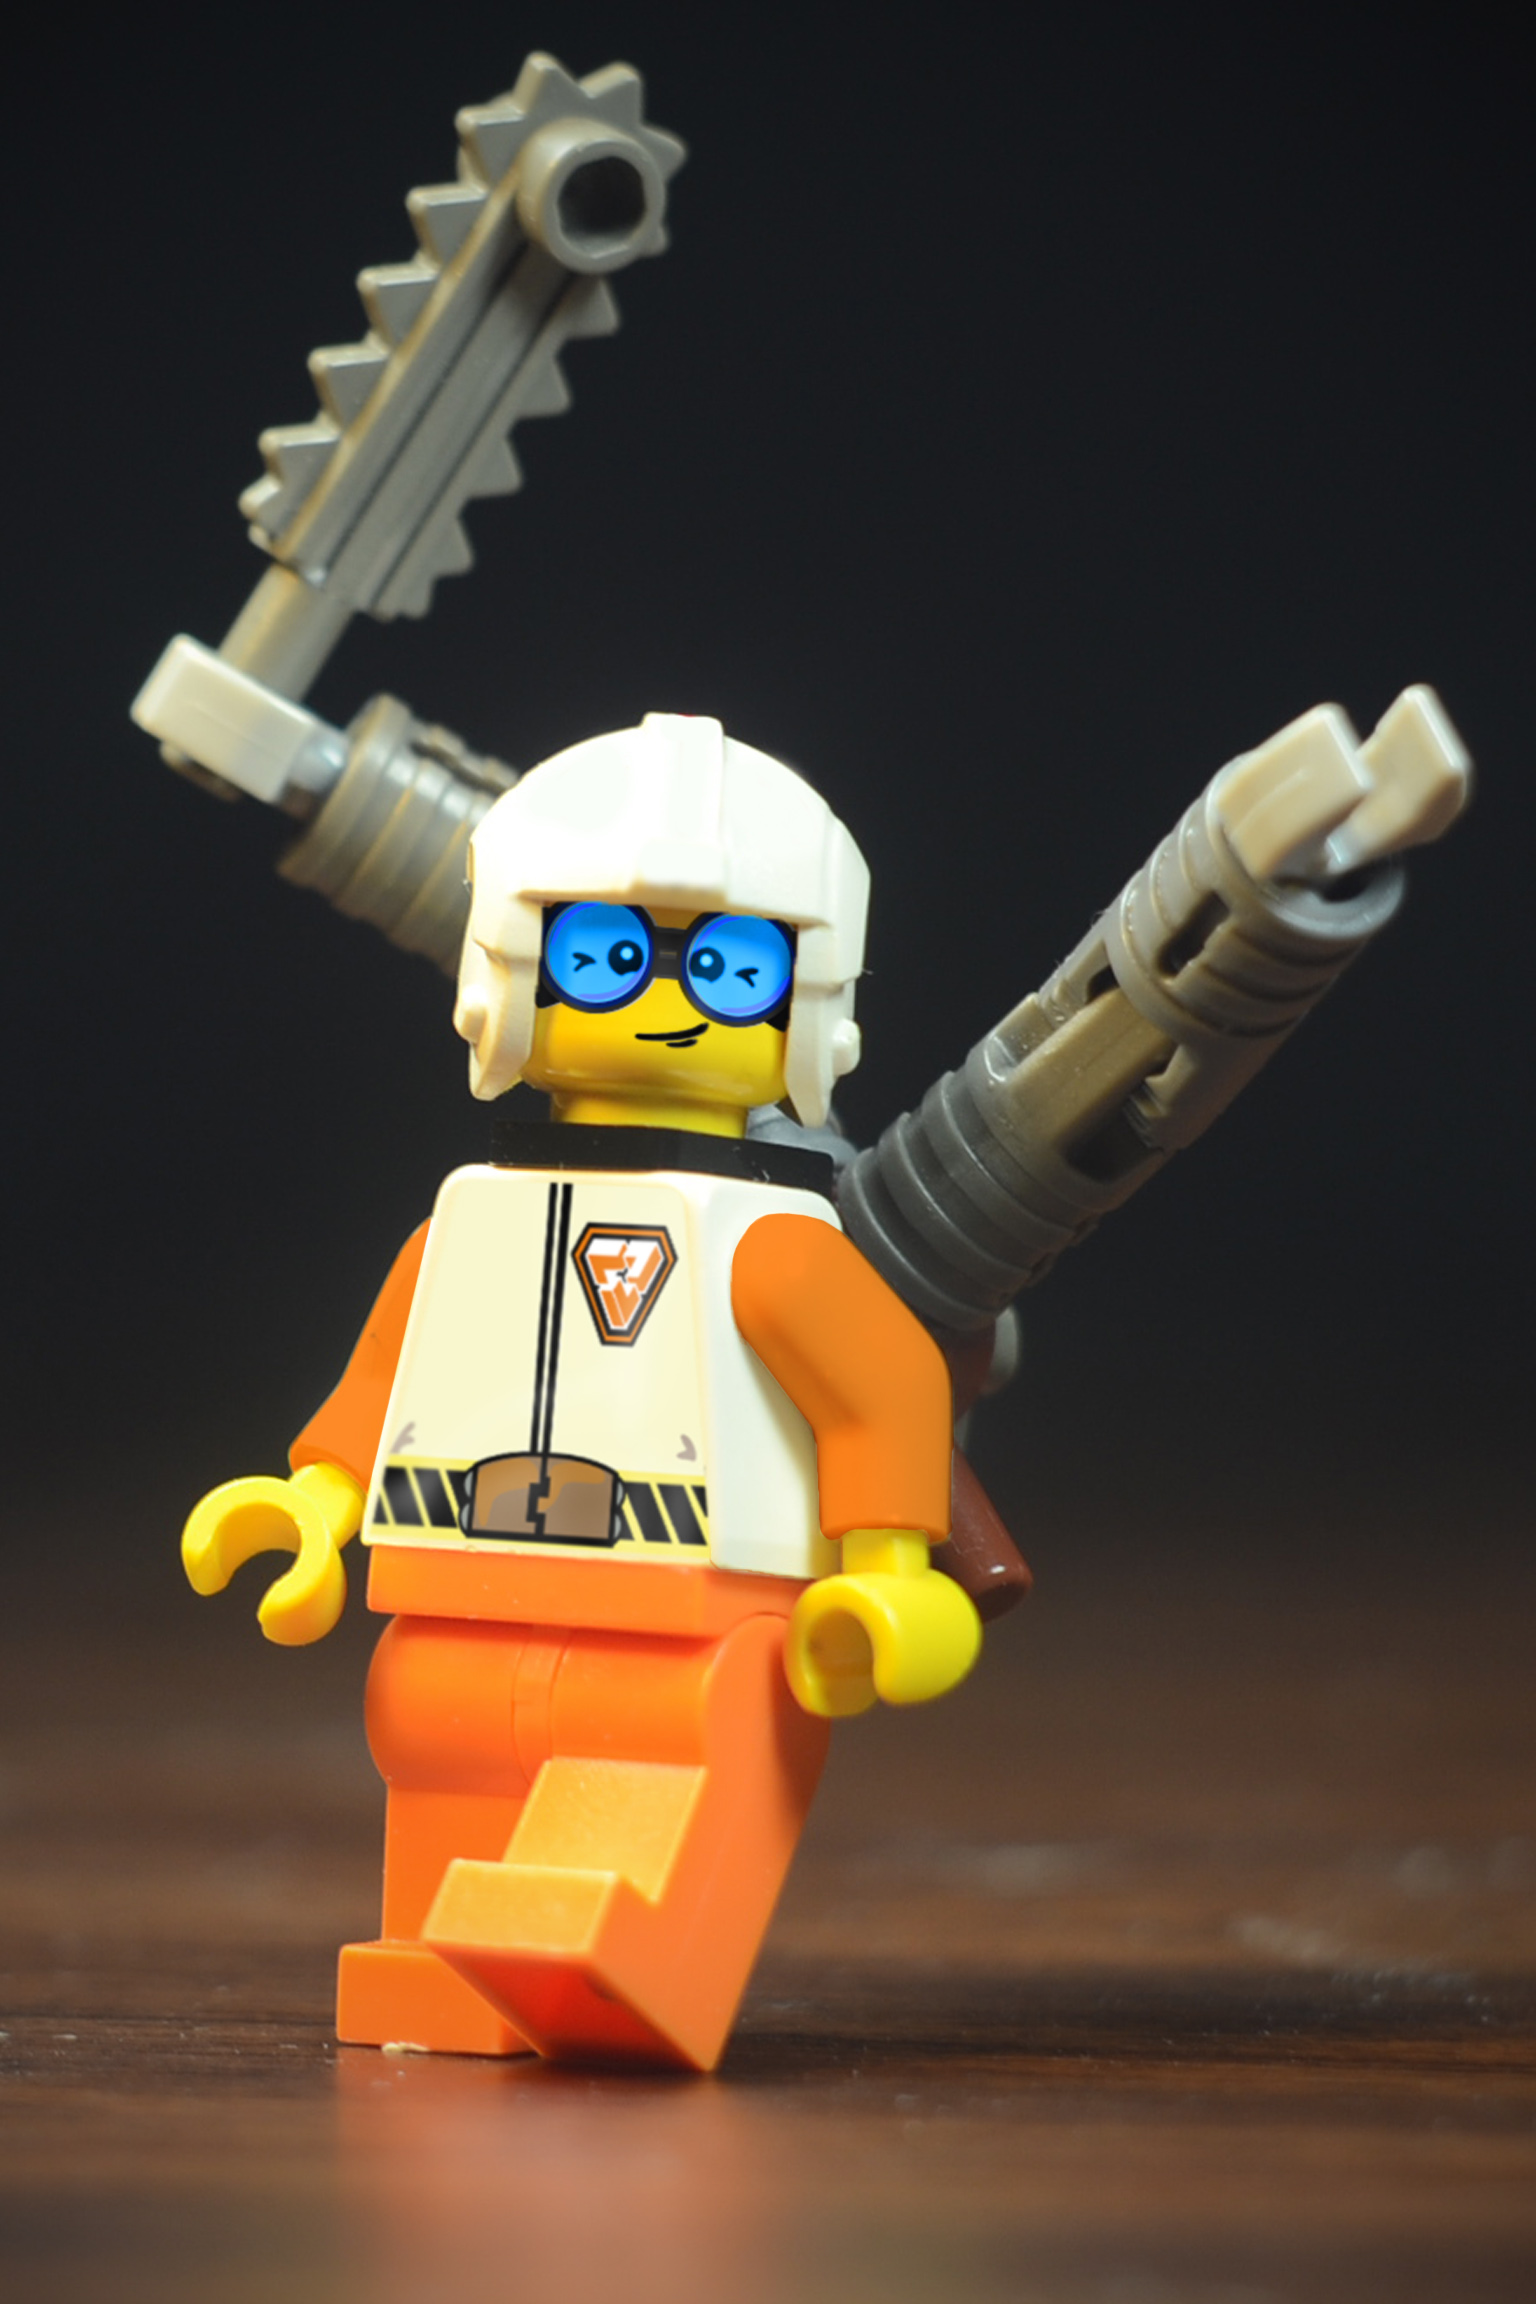 http://bricksafe.com/files/rioforce/Minifigures/Doc%20Overbuild/Overbuild%20Decal%20Test2.jpg